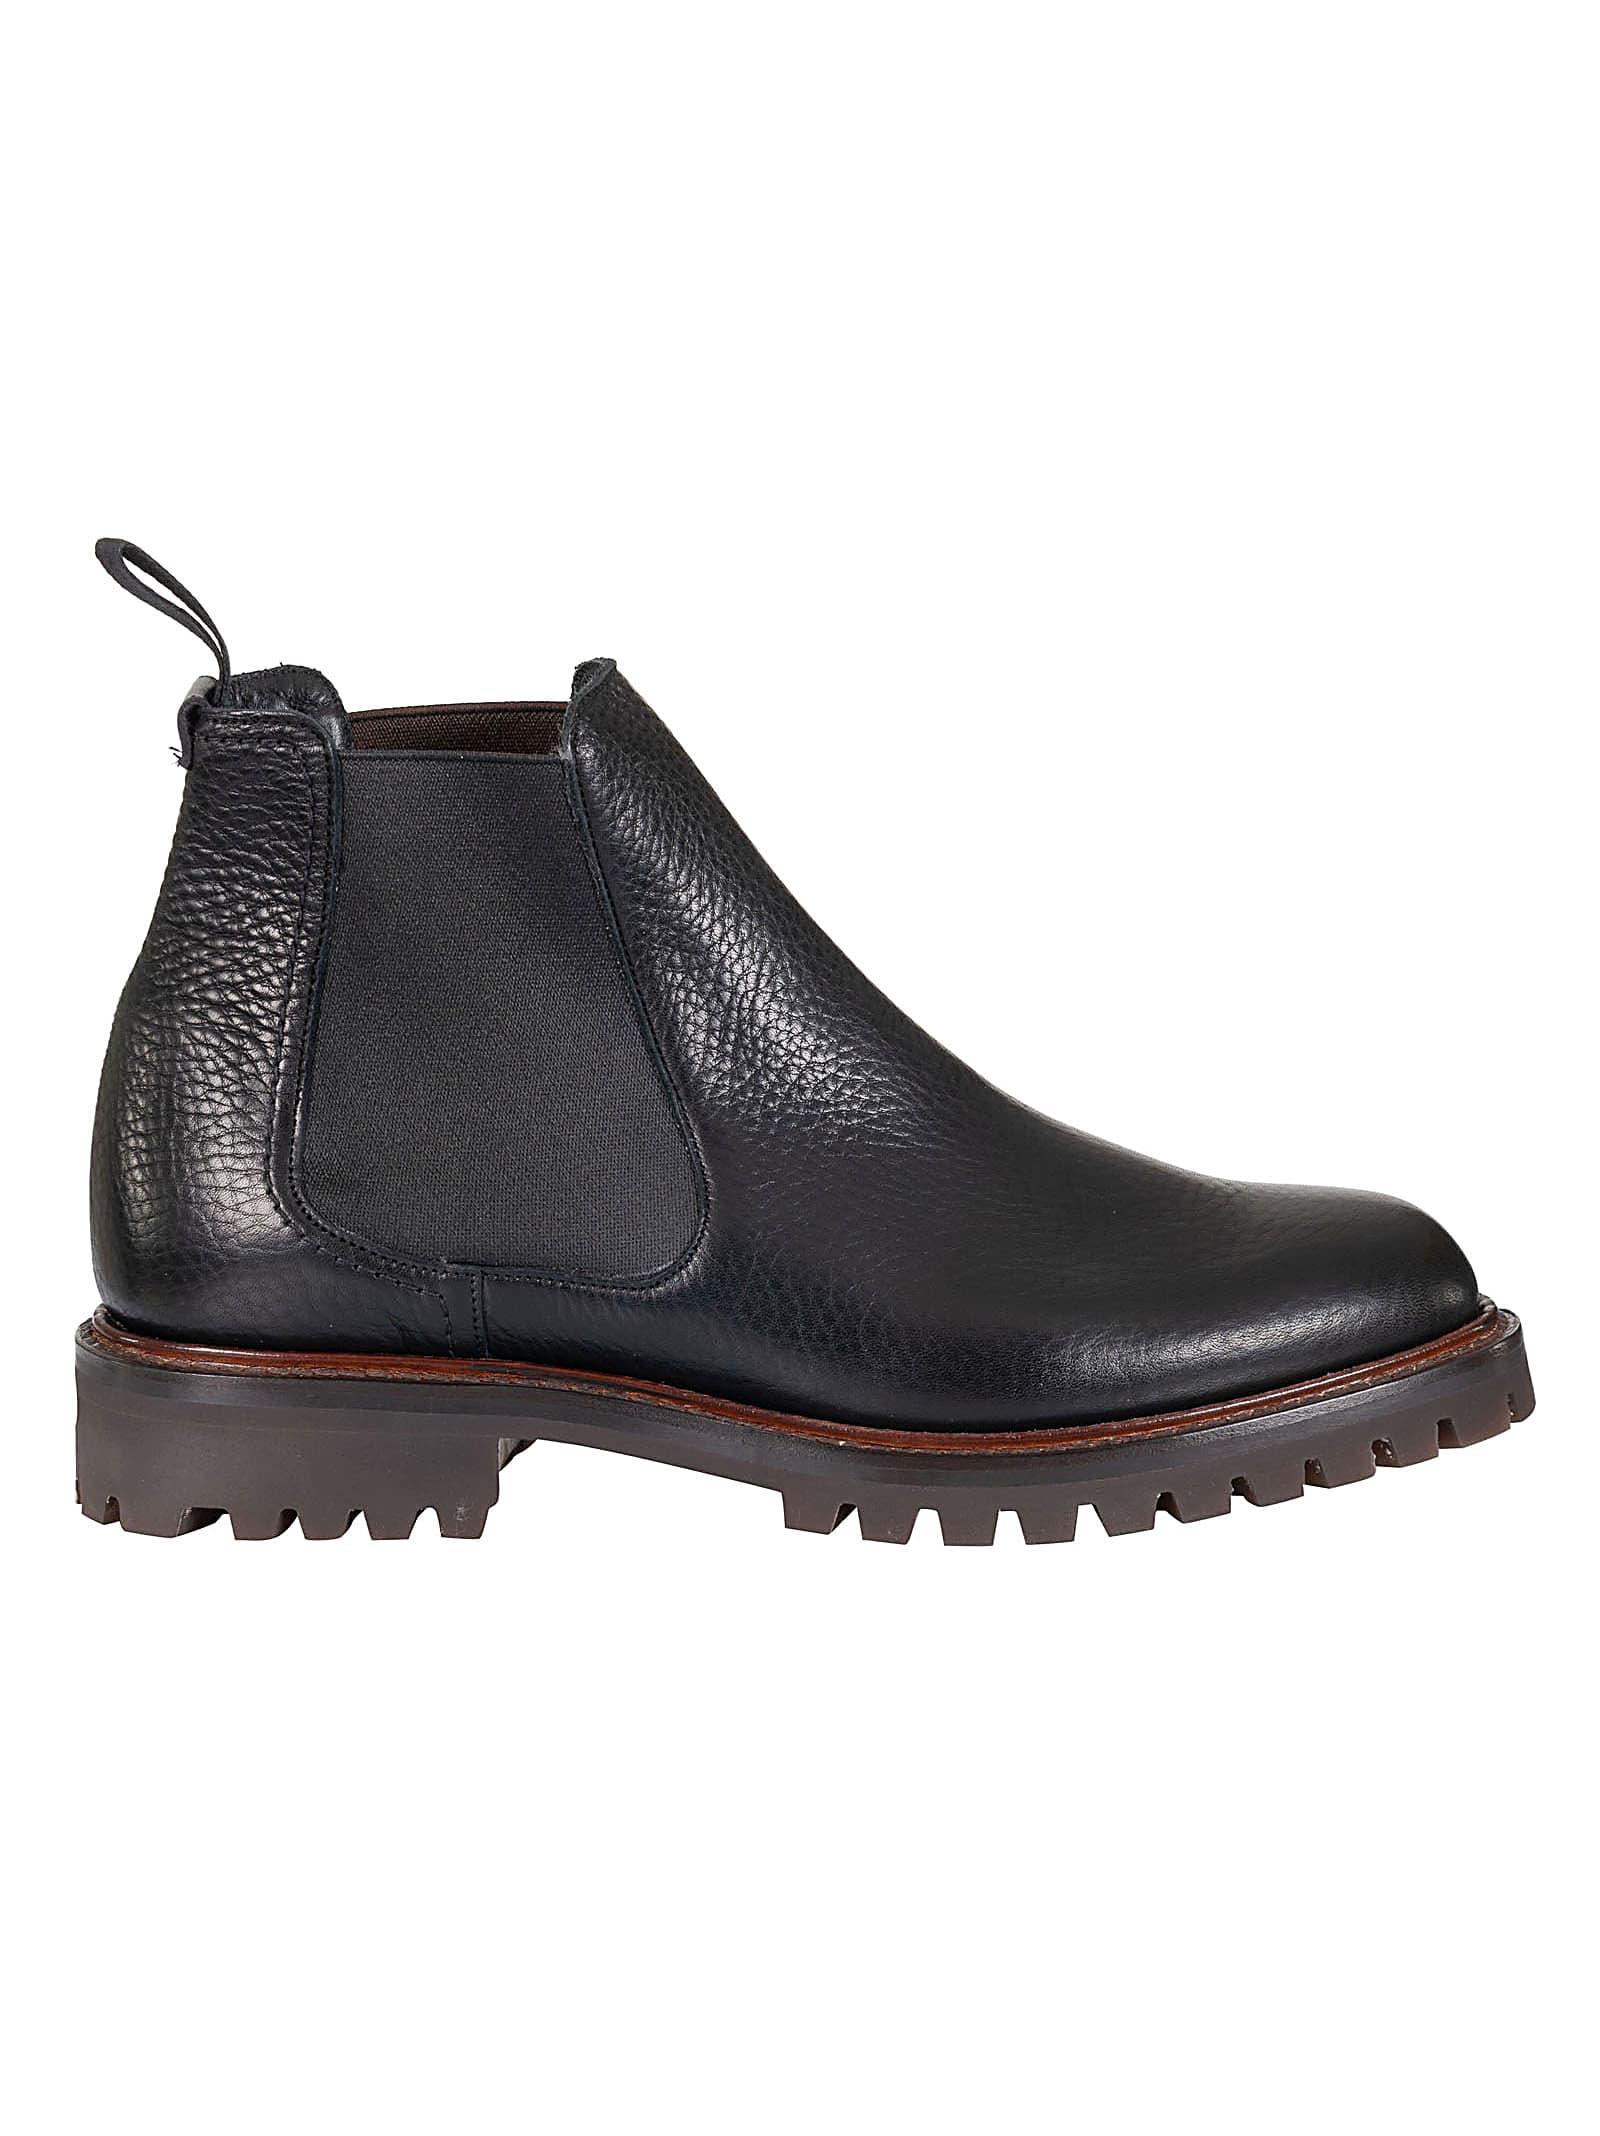 Churchs Cornwood Ankle Boots